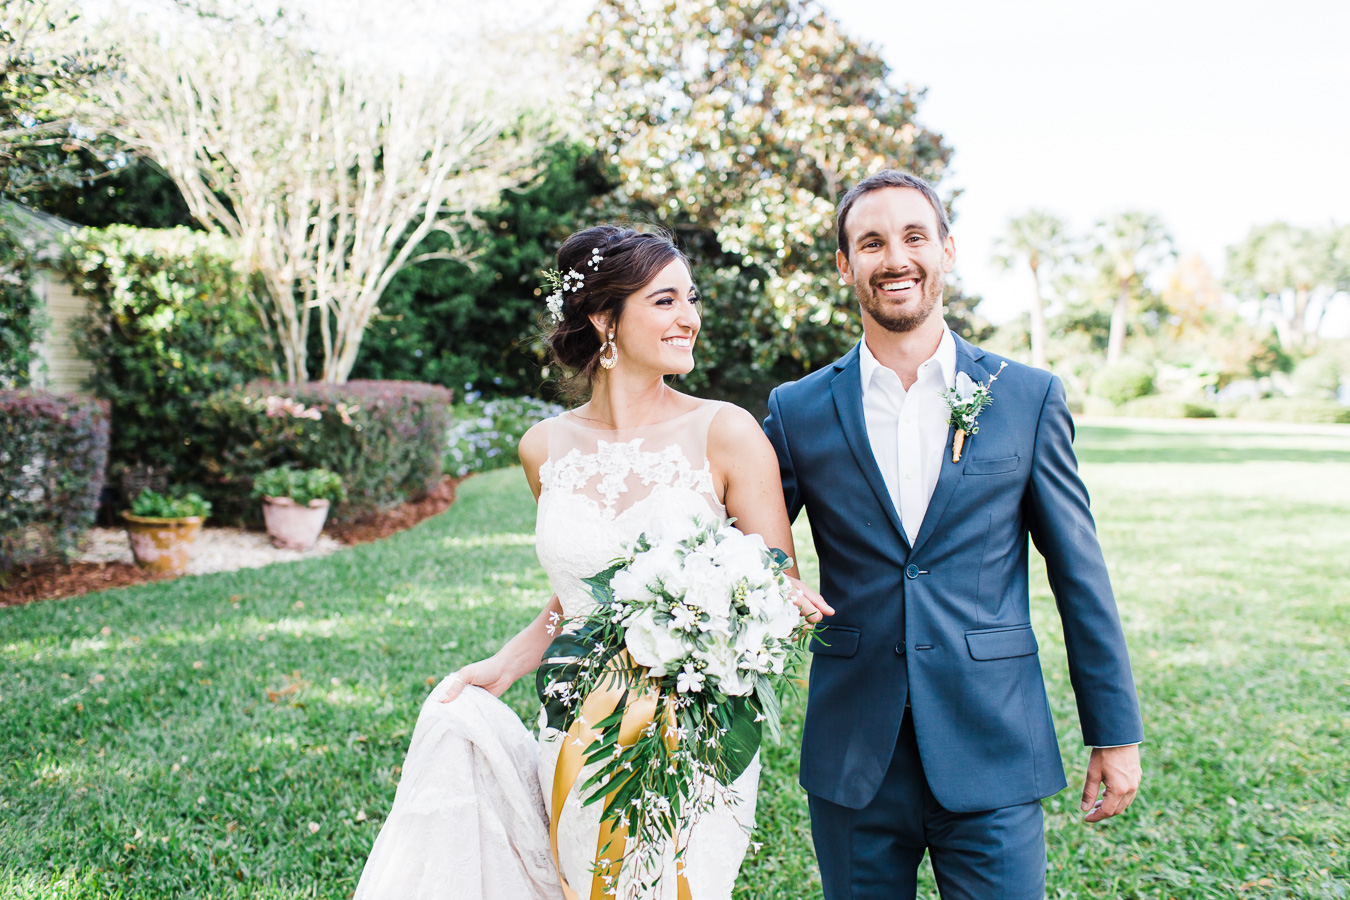 Wedding-photographer-orlando-45.jpg